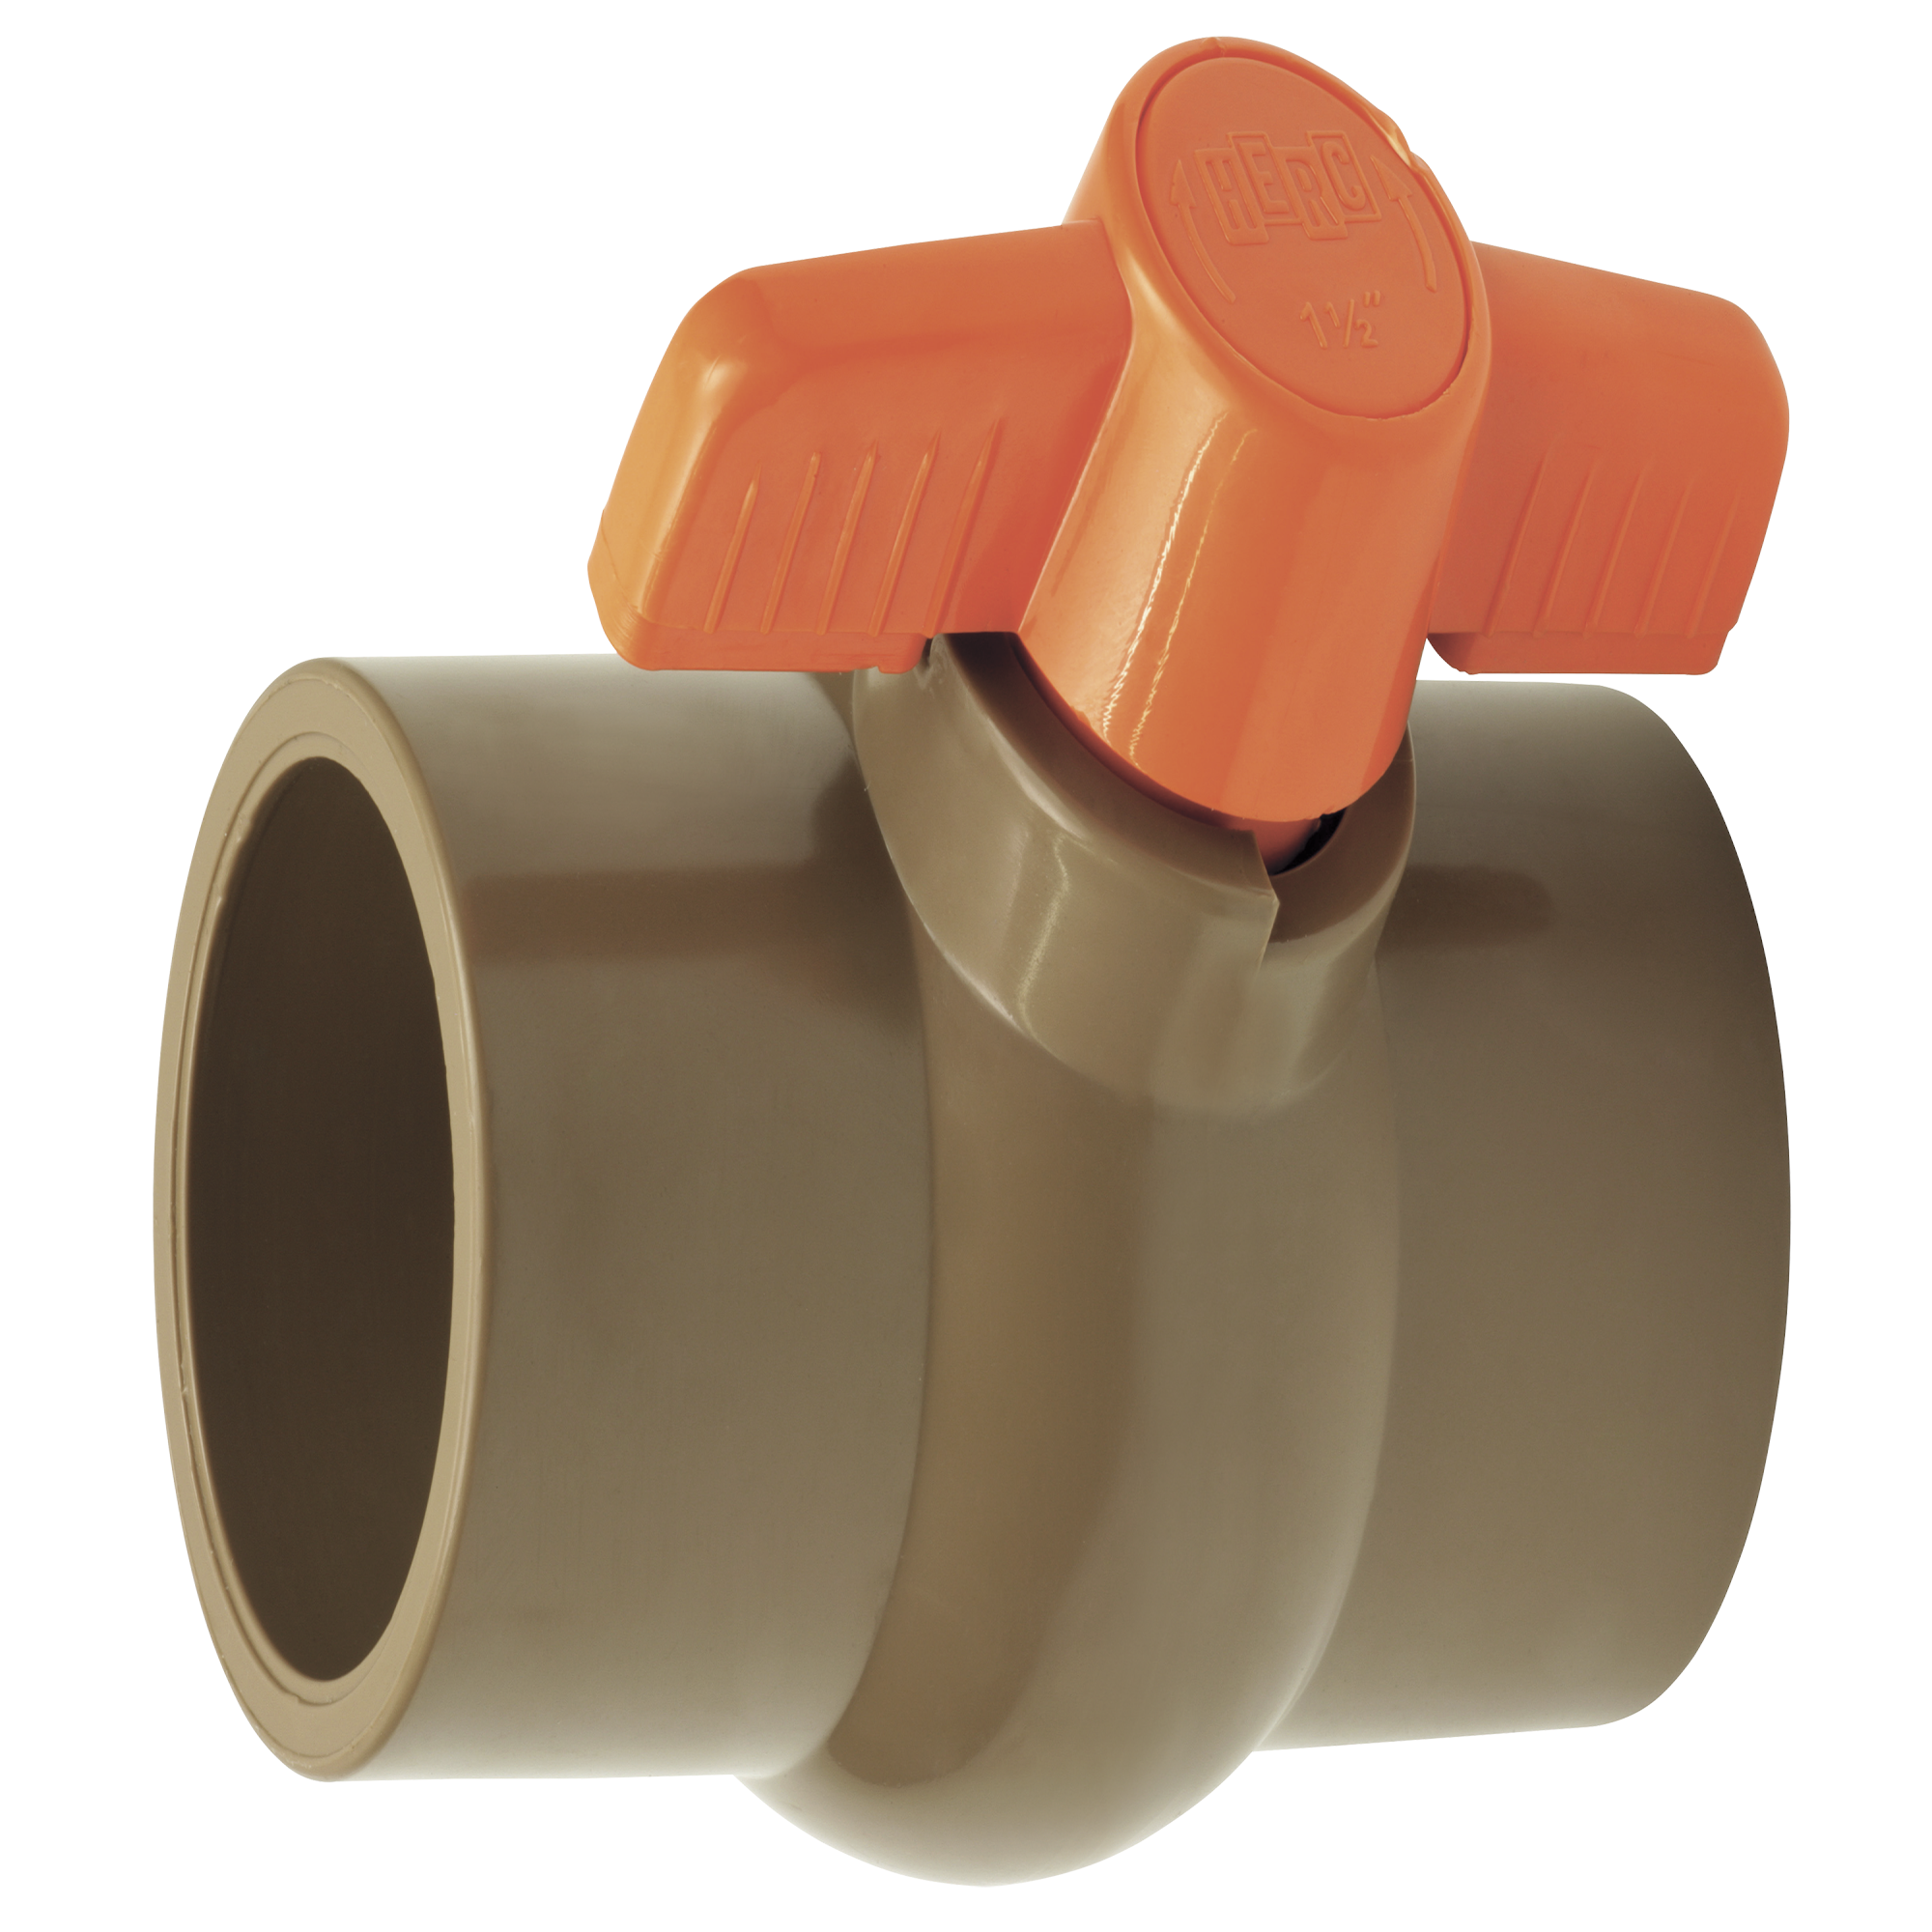 Registro Esfera PVC Alavanca 20mm - Herc